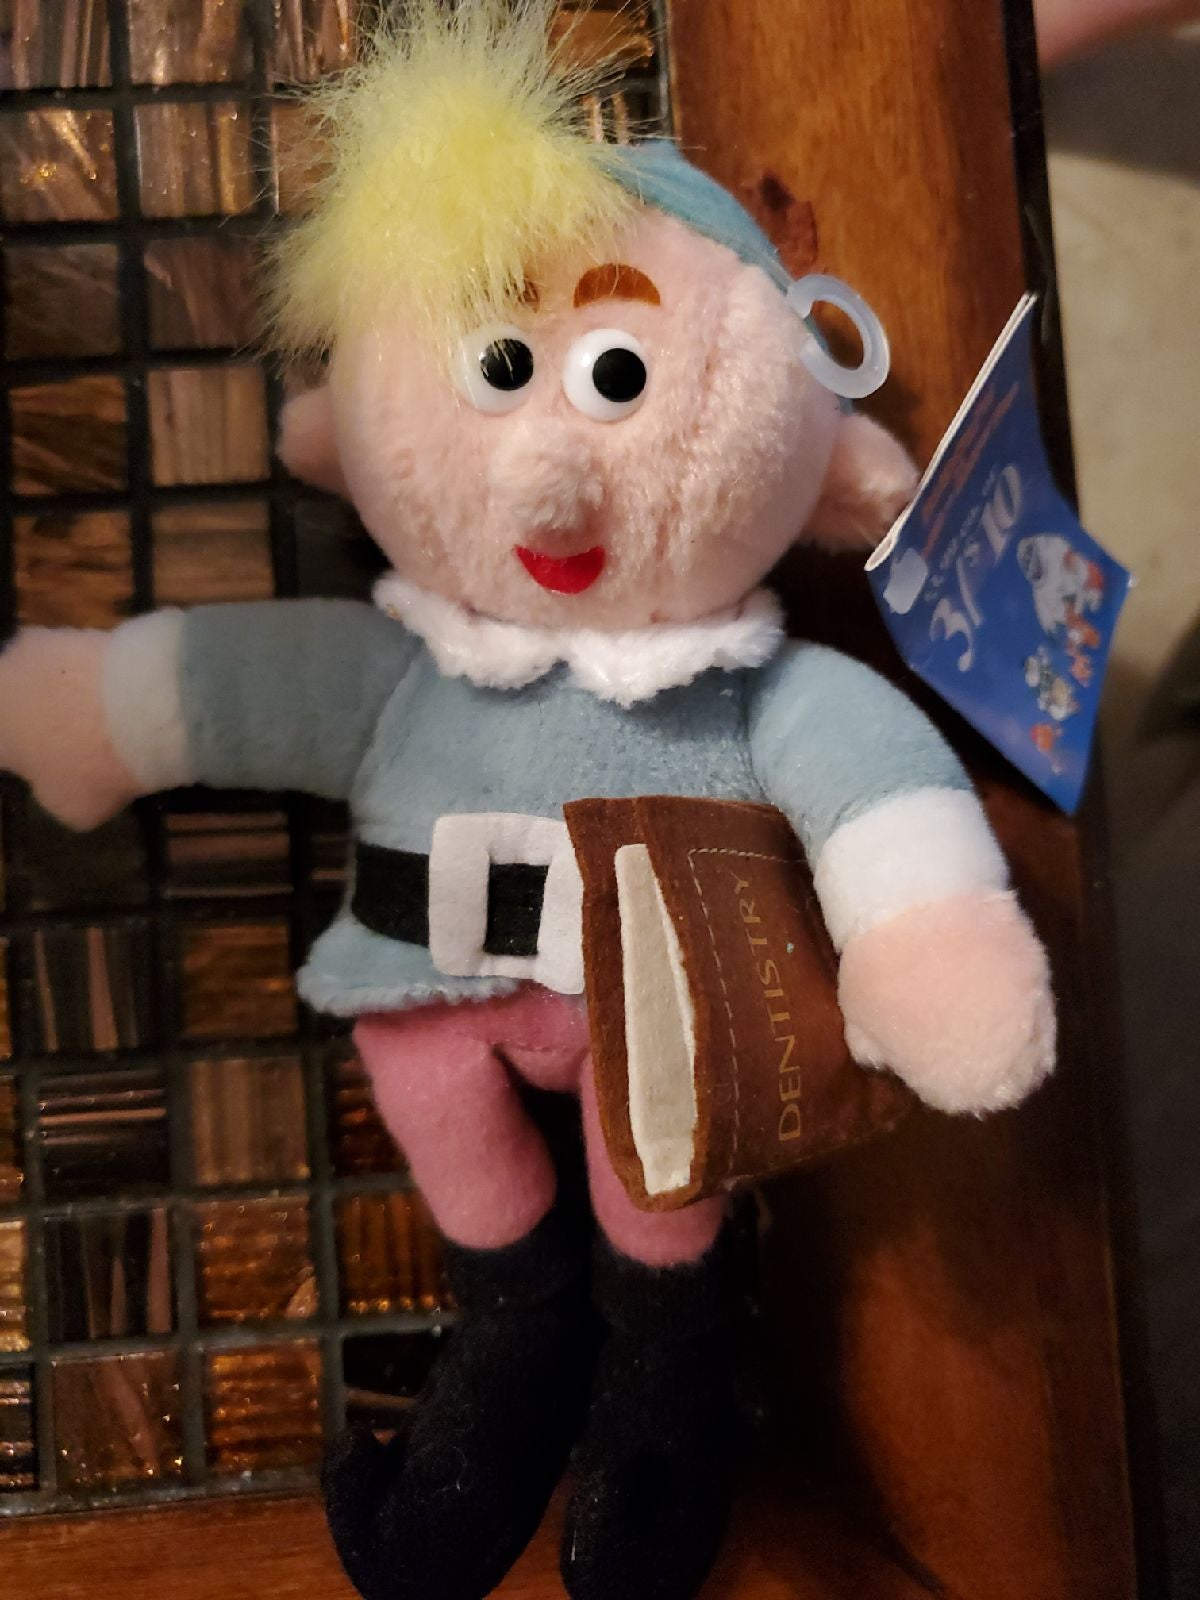 Hermey the elf